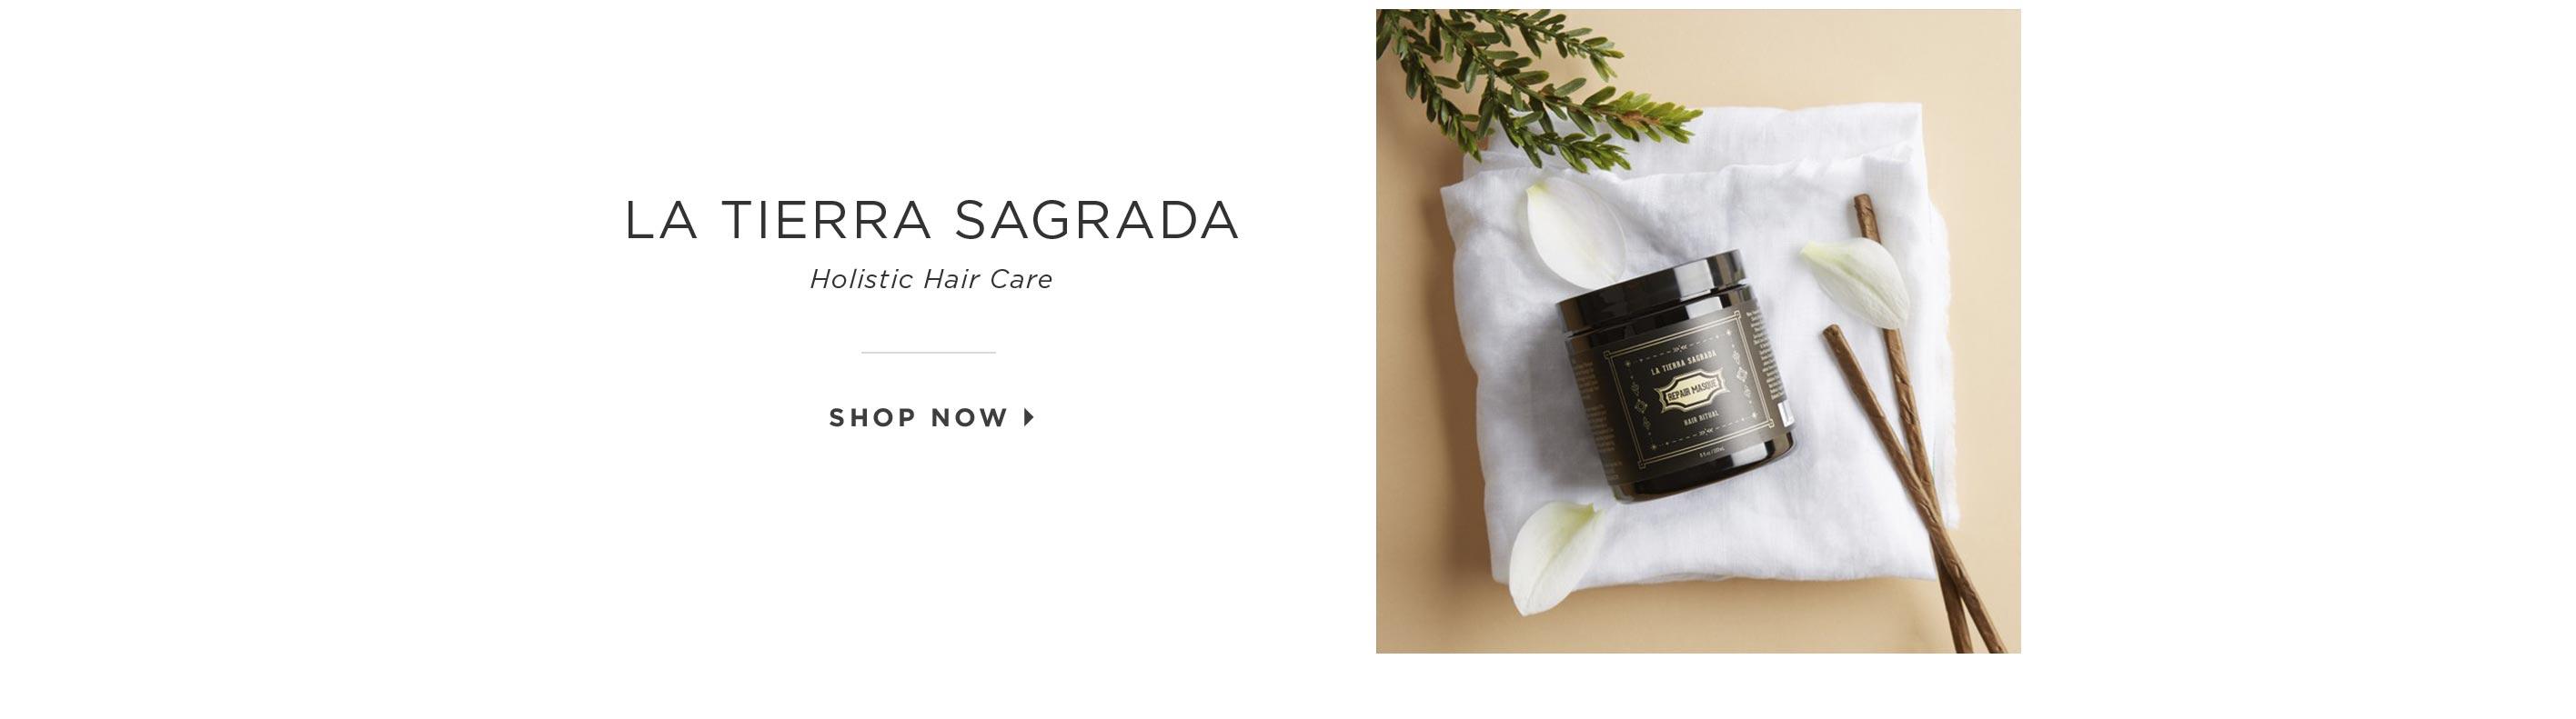 La Tierra Sagrada – Holistic Hair Care. Shop Now.